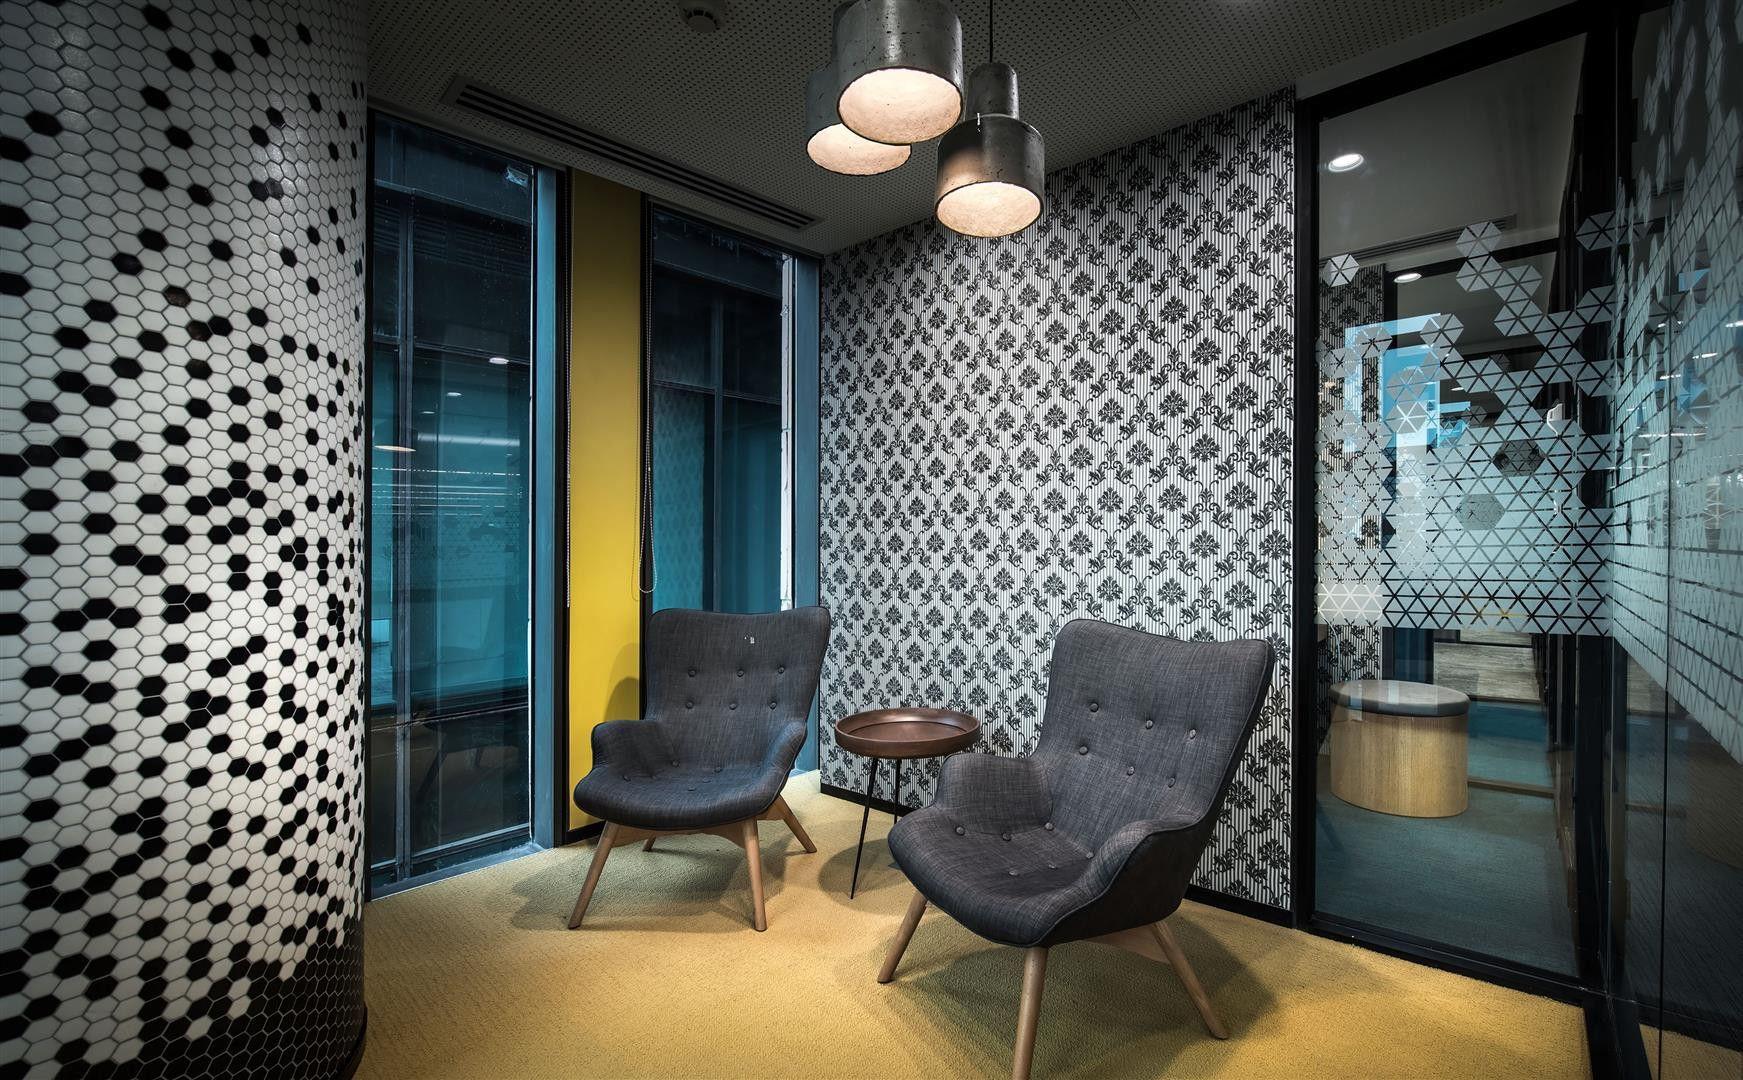 Office Furniture Design Office Space Interior Design Find The